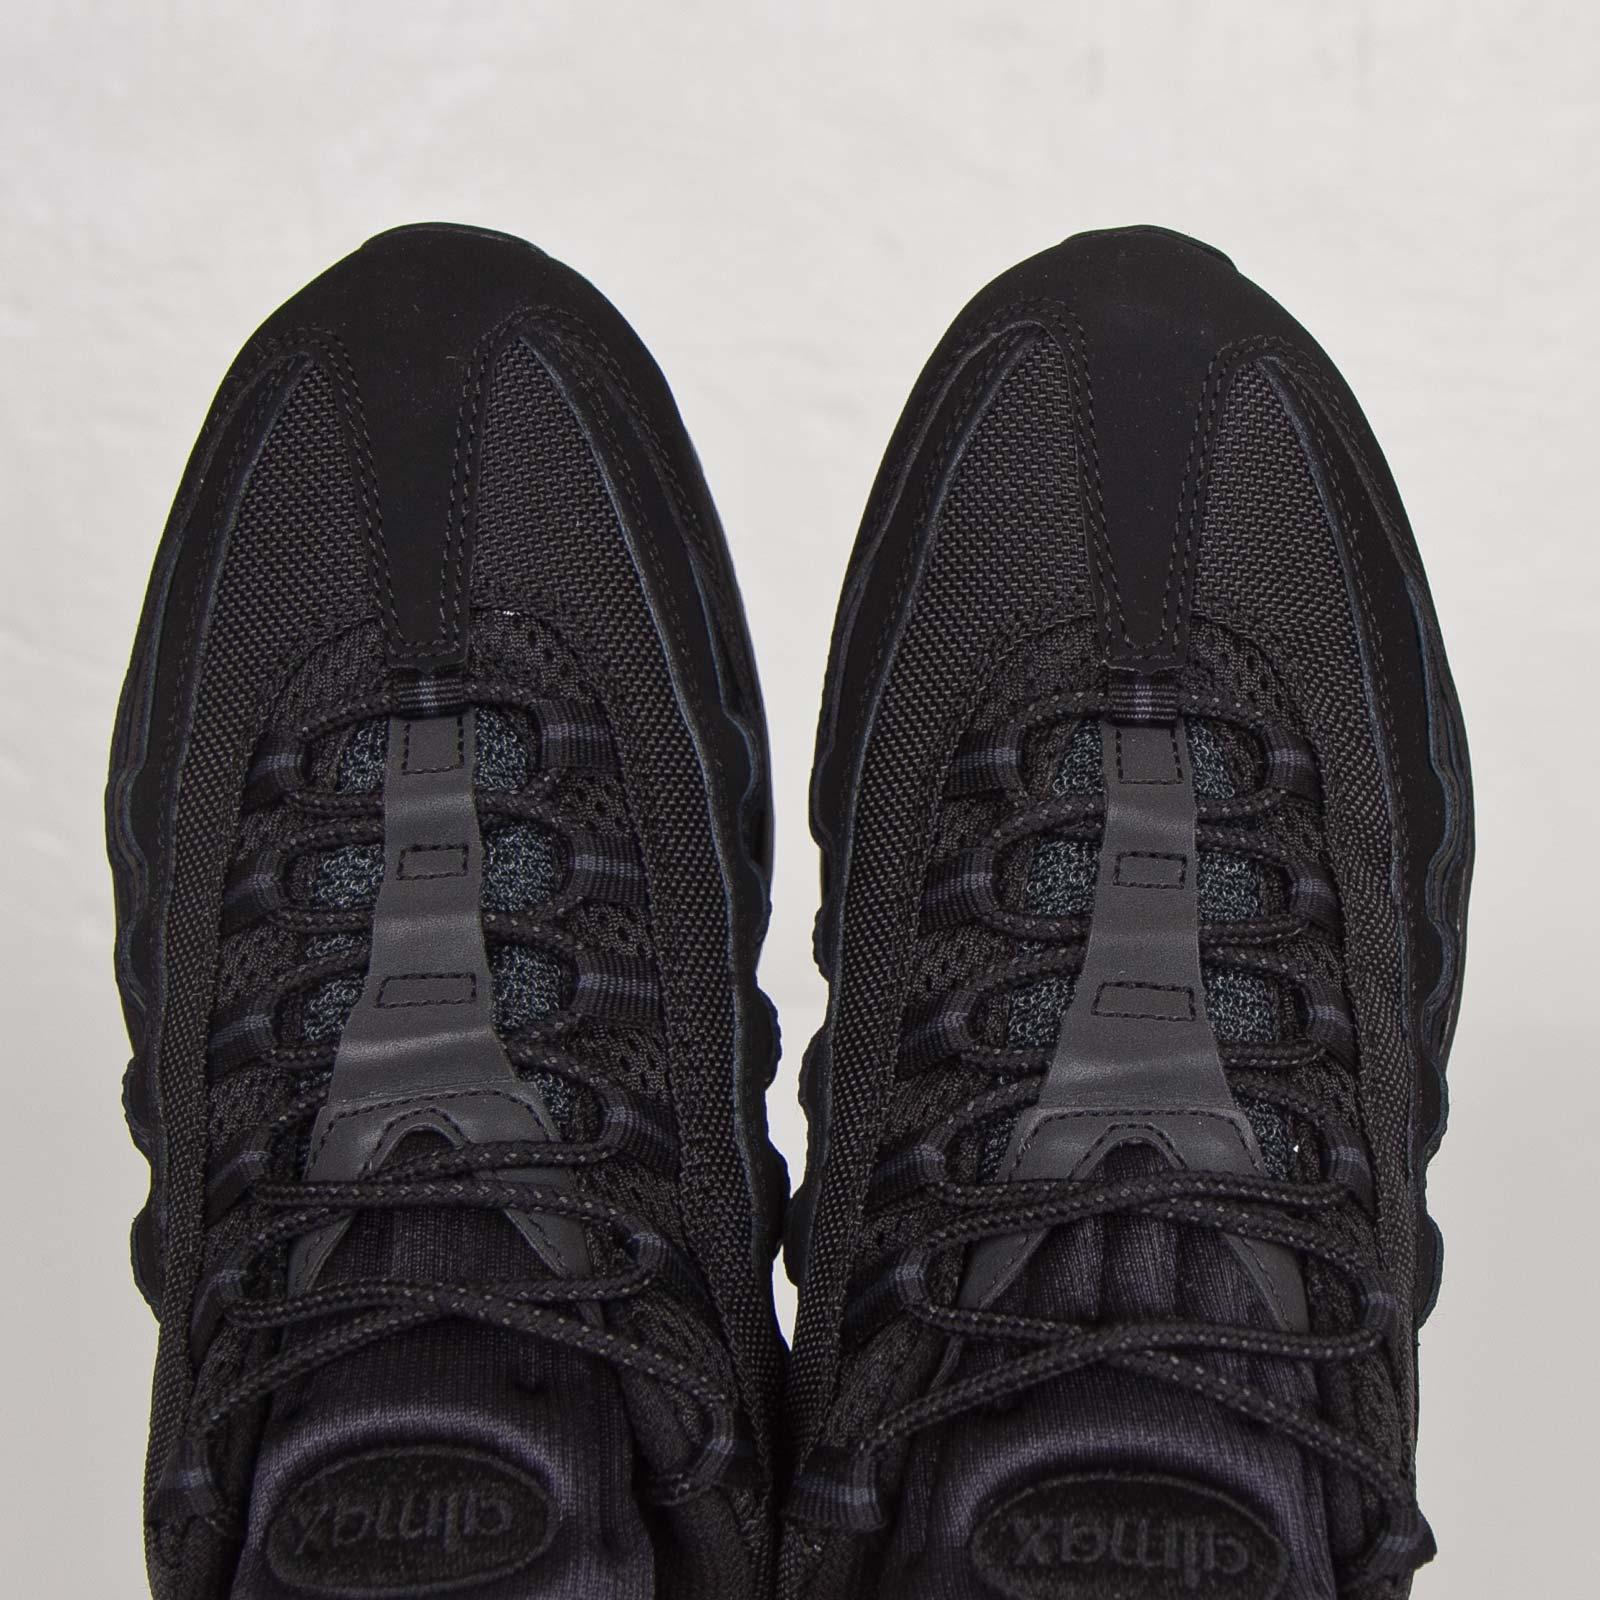 finest selection 7aa86 f3c62 Nike Air Max 95 - 609048-092 - Sneakersnstuff   sneakers   streetwear  online since 1999